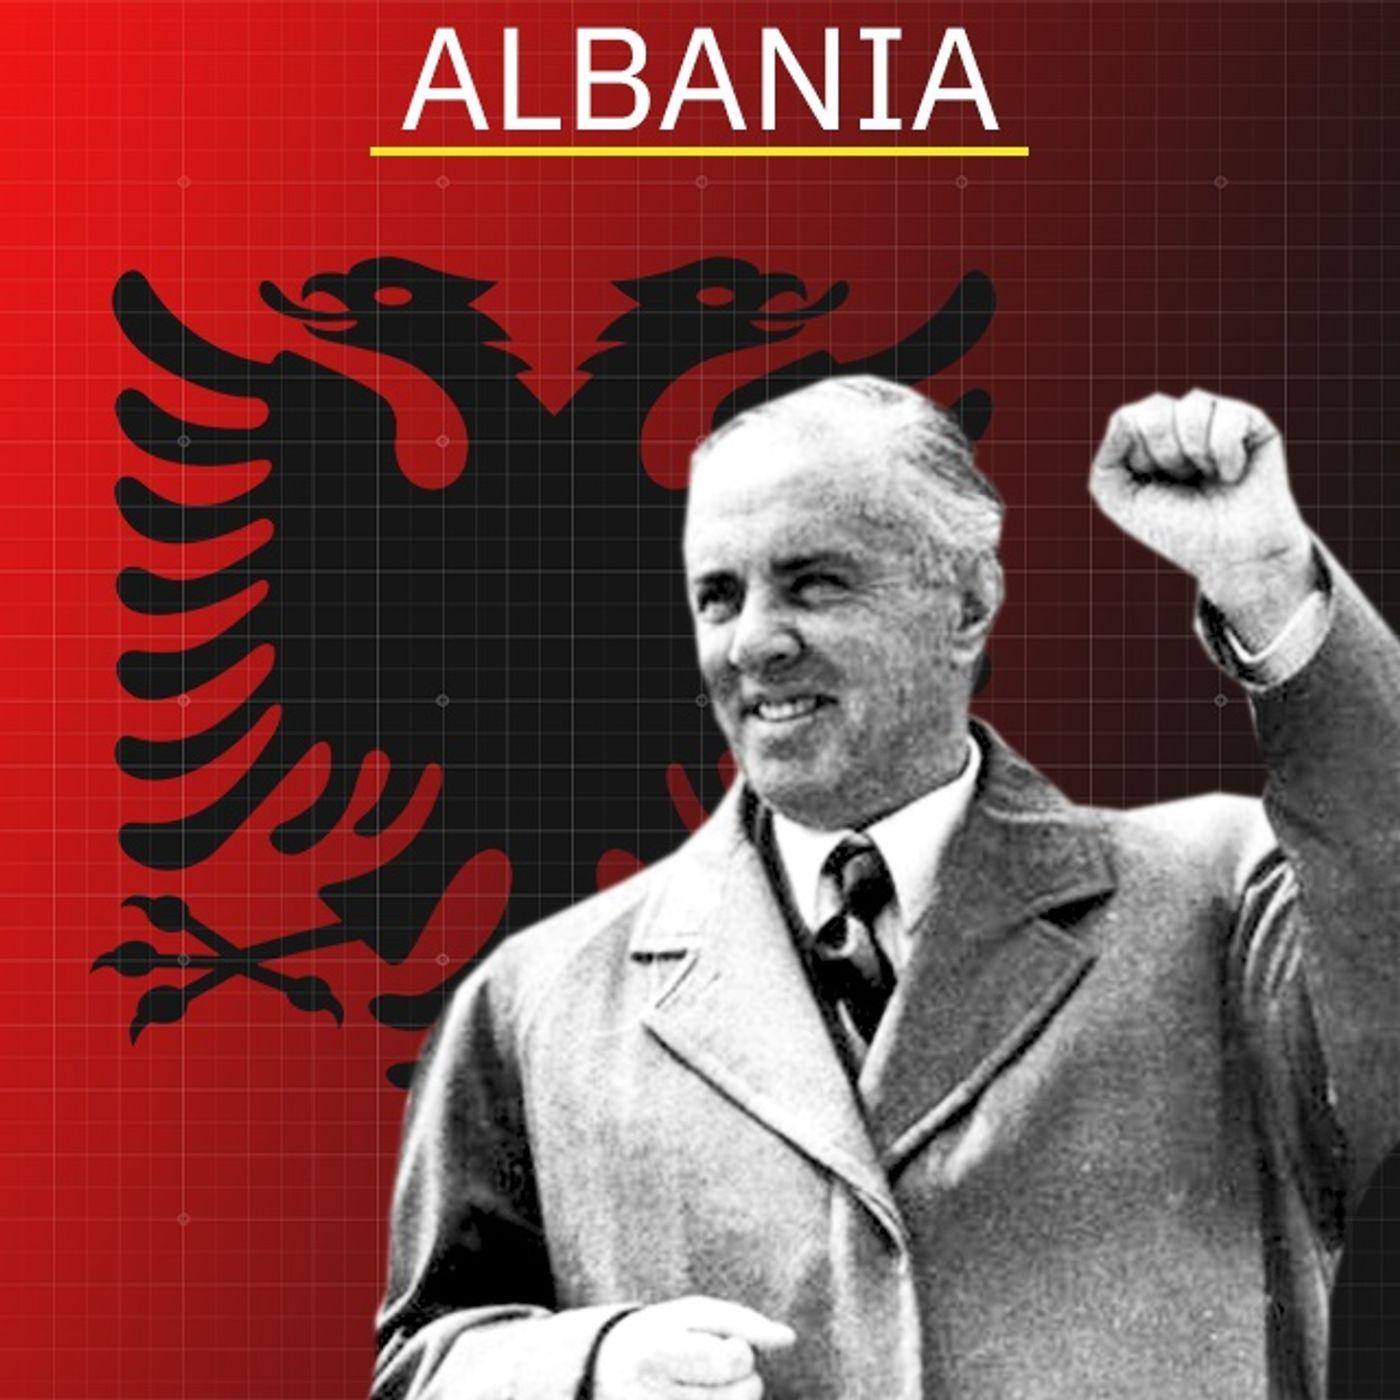 Storia dell'Albania dall'indipendenza al regime di Enver Hoxha